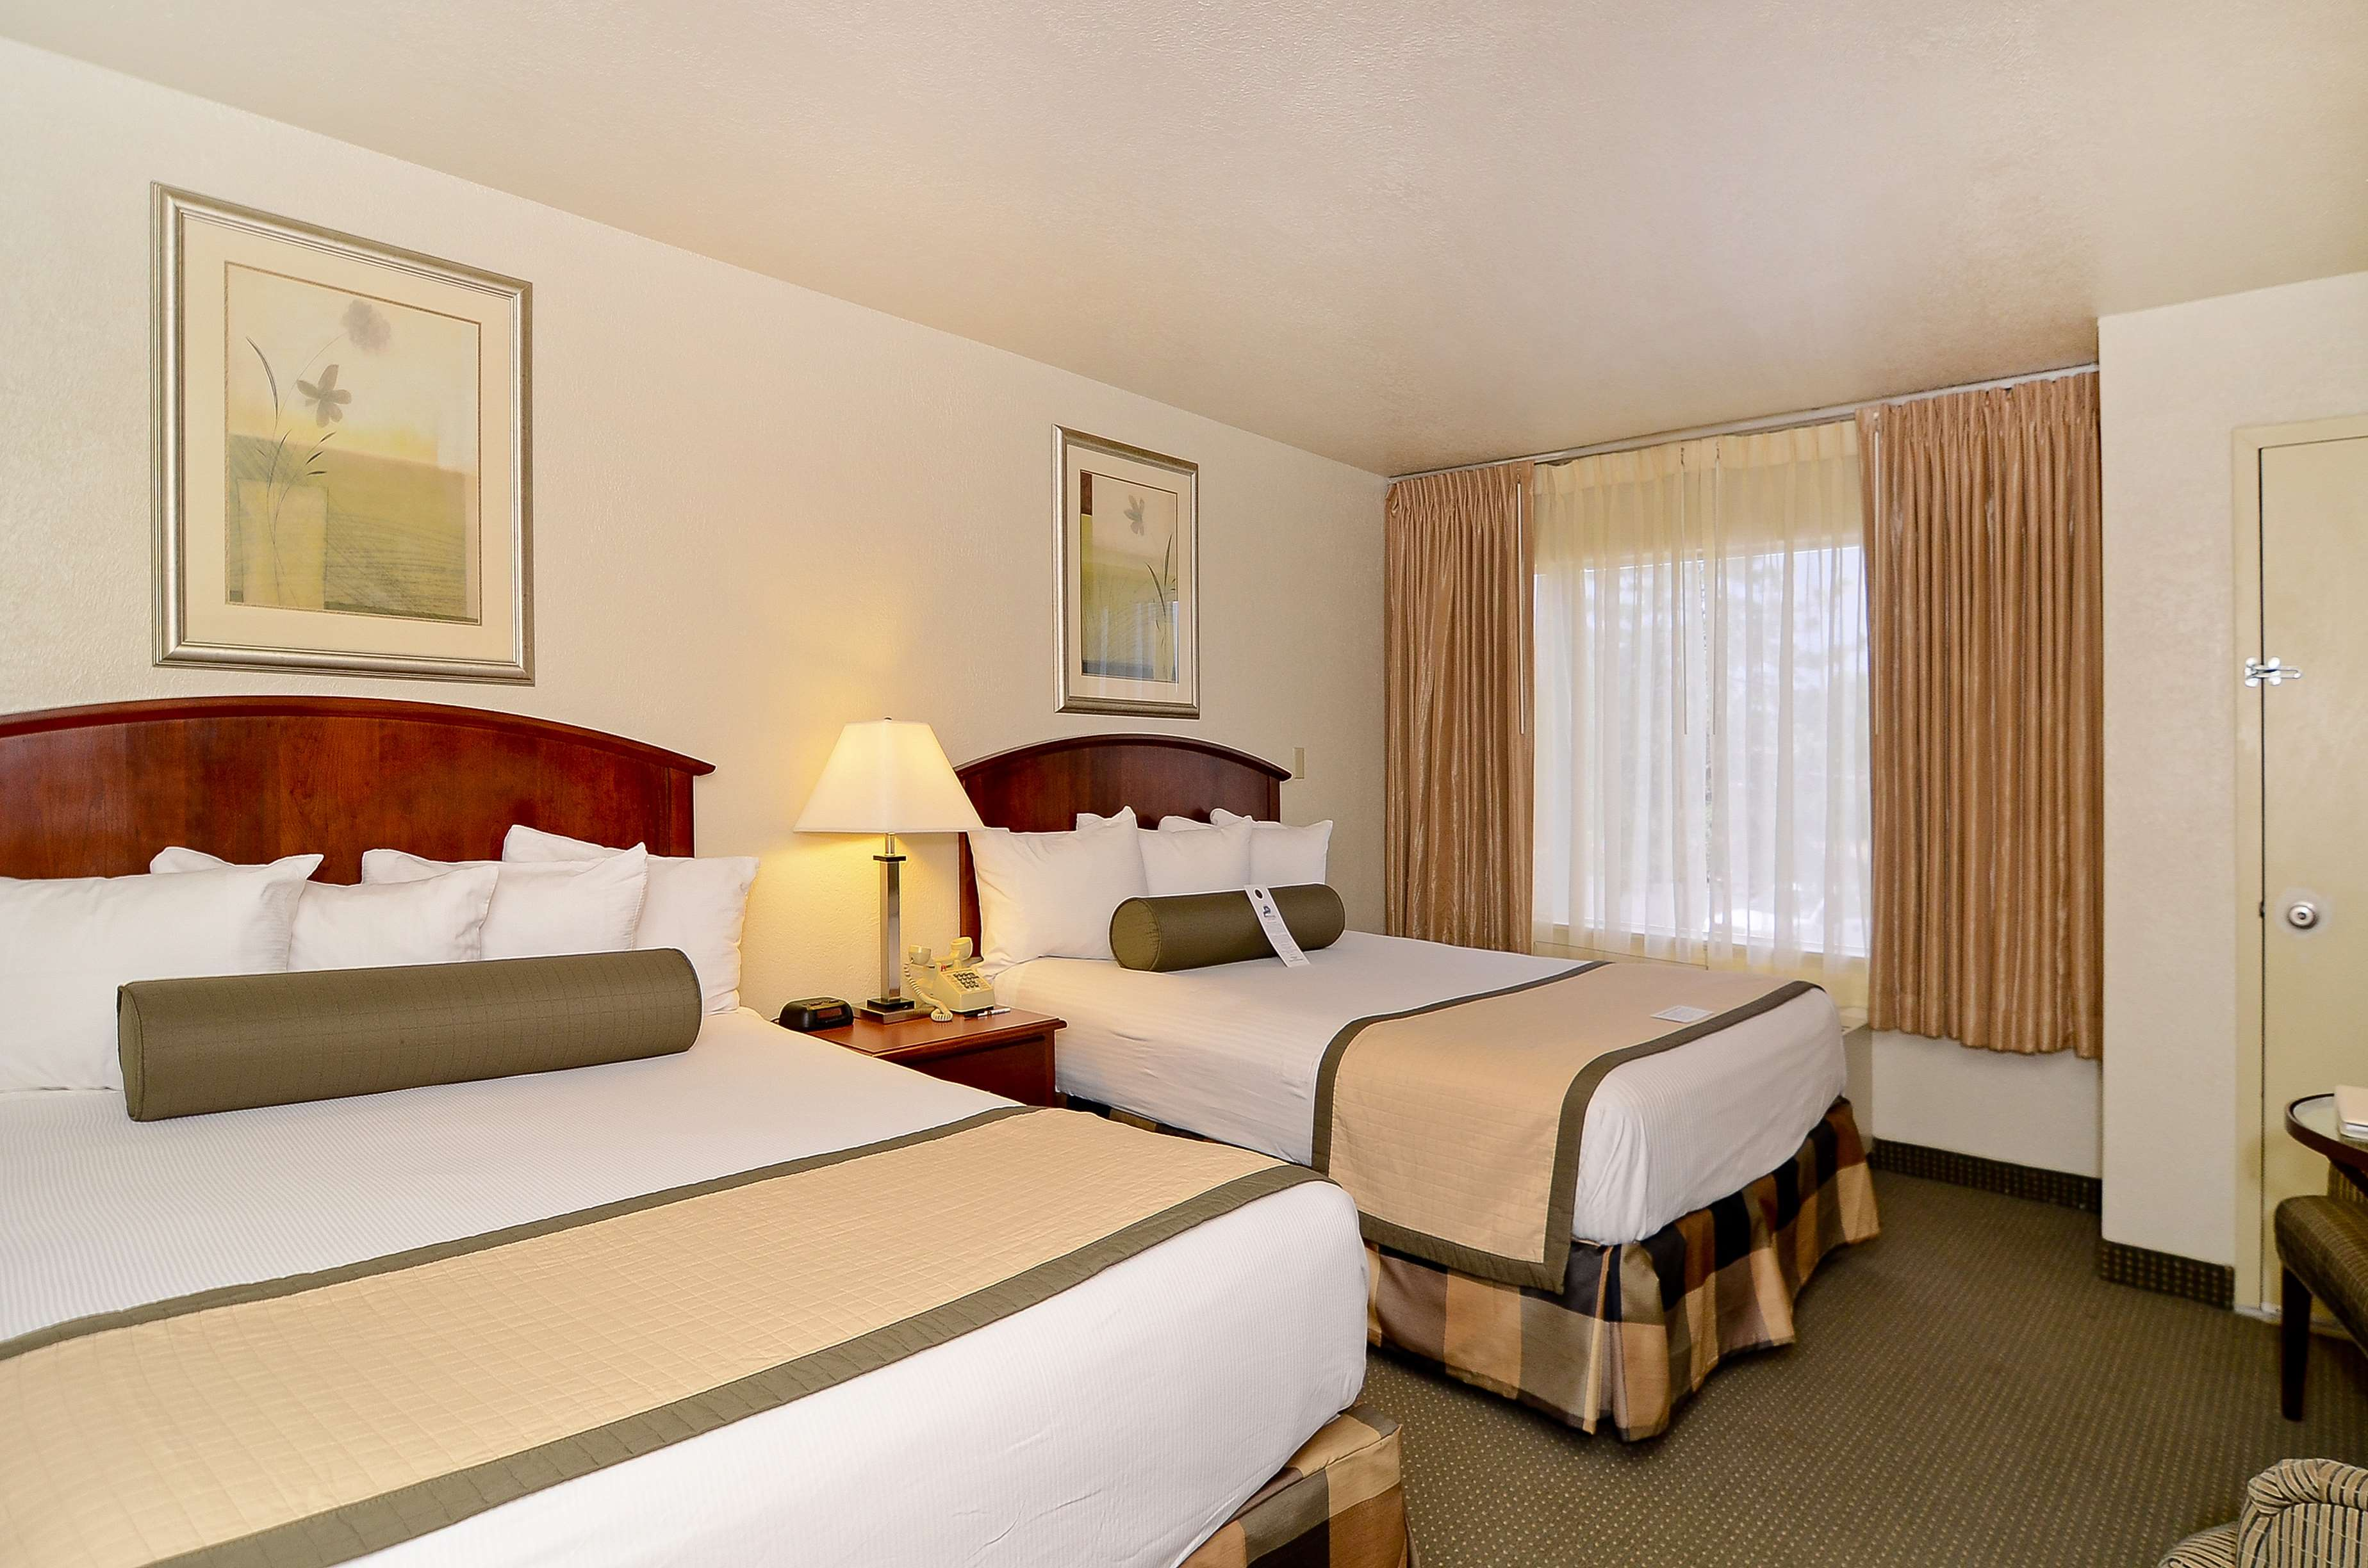 Best Western Plus Lawton Hotel & Convention Center image 47